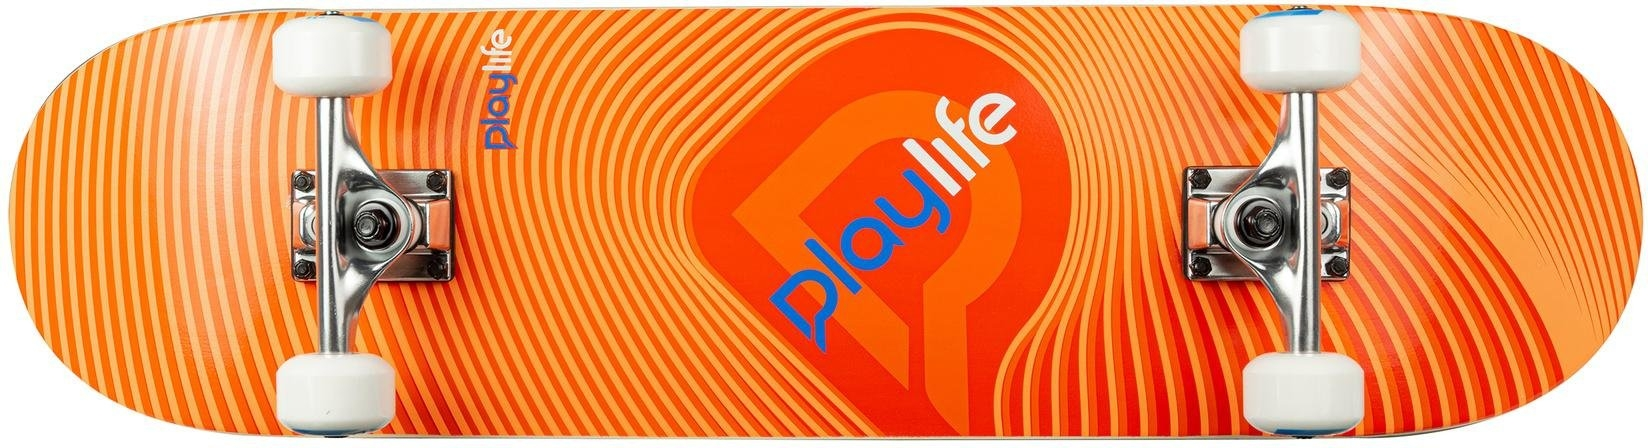 Playlife skateboard »Illusion Orange« online kopen op otto.nl